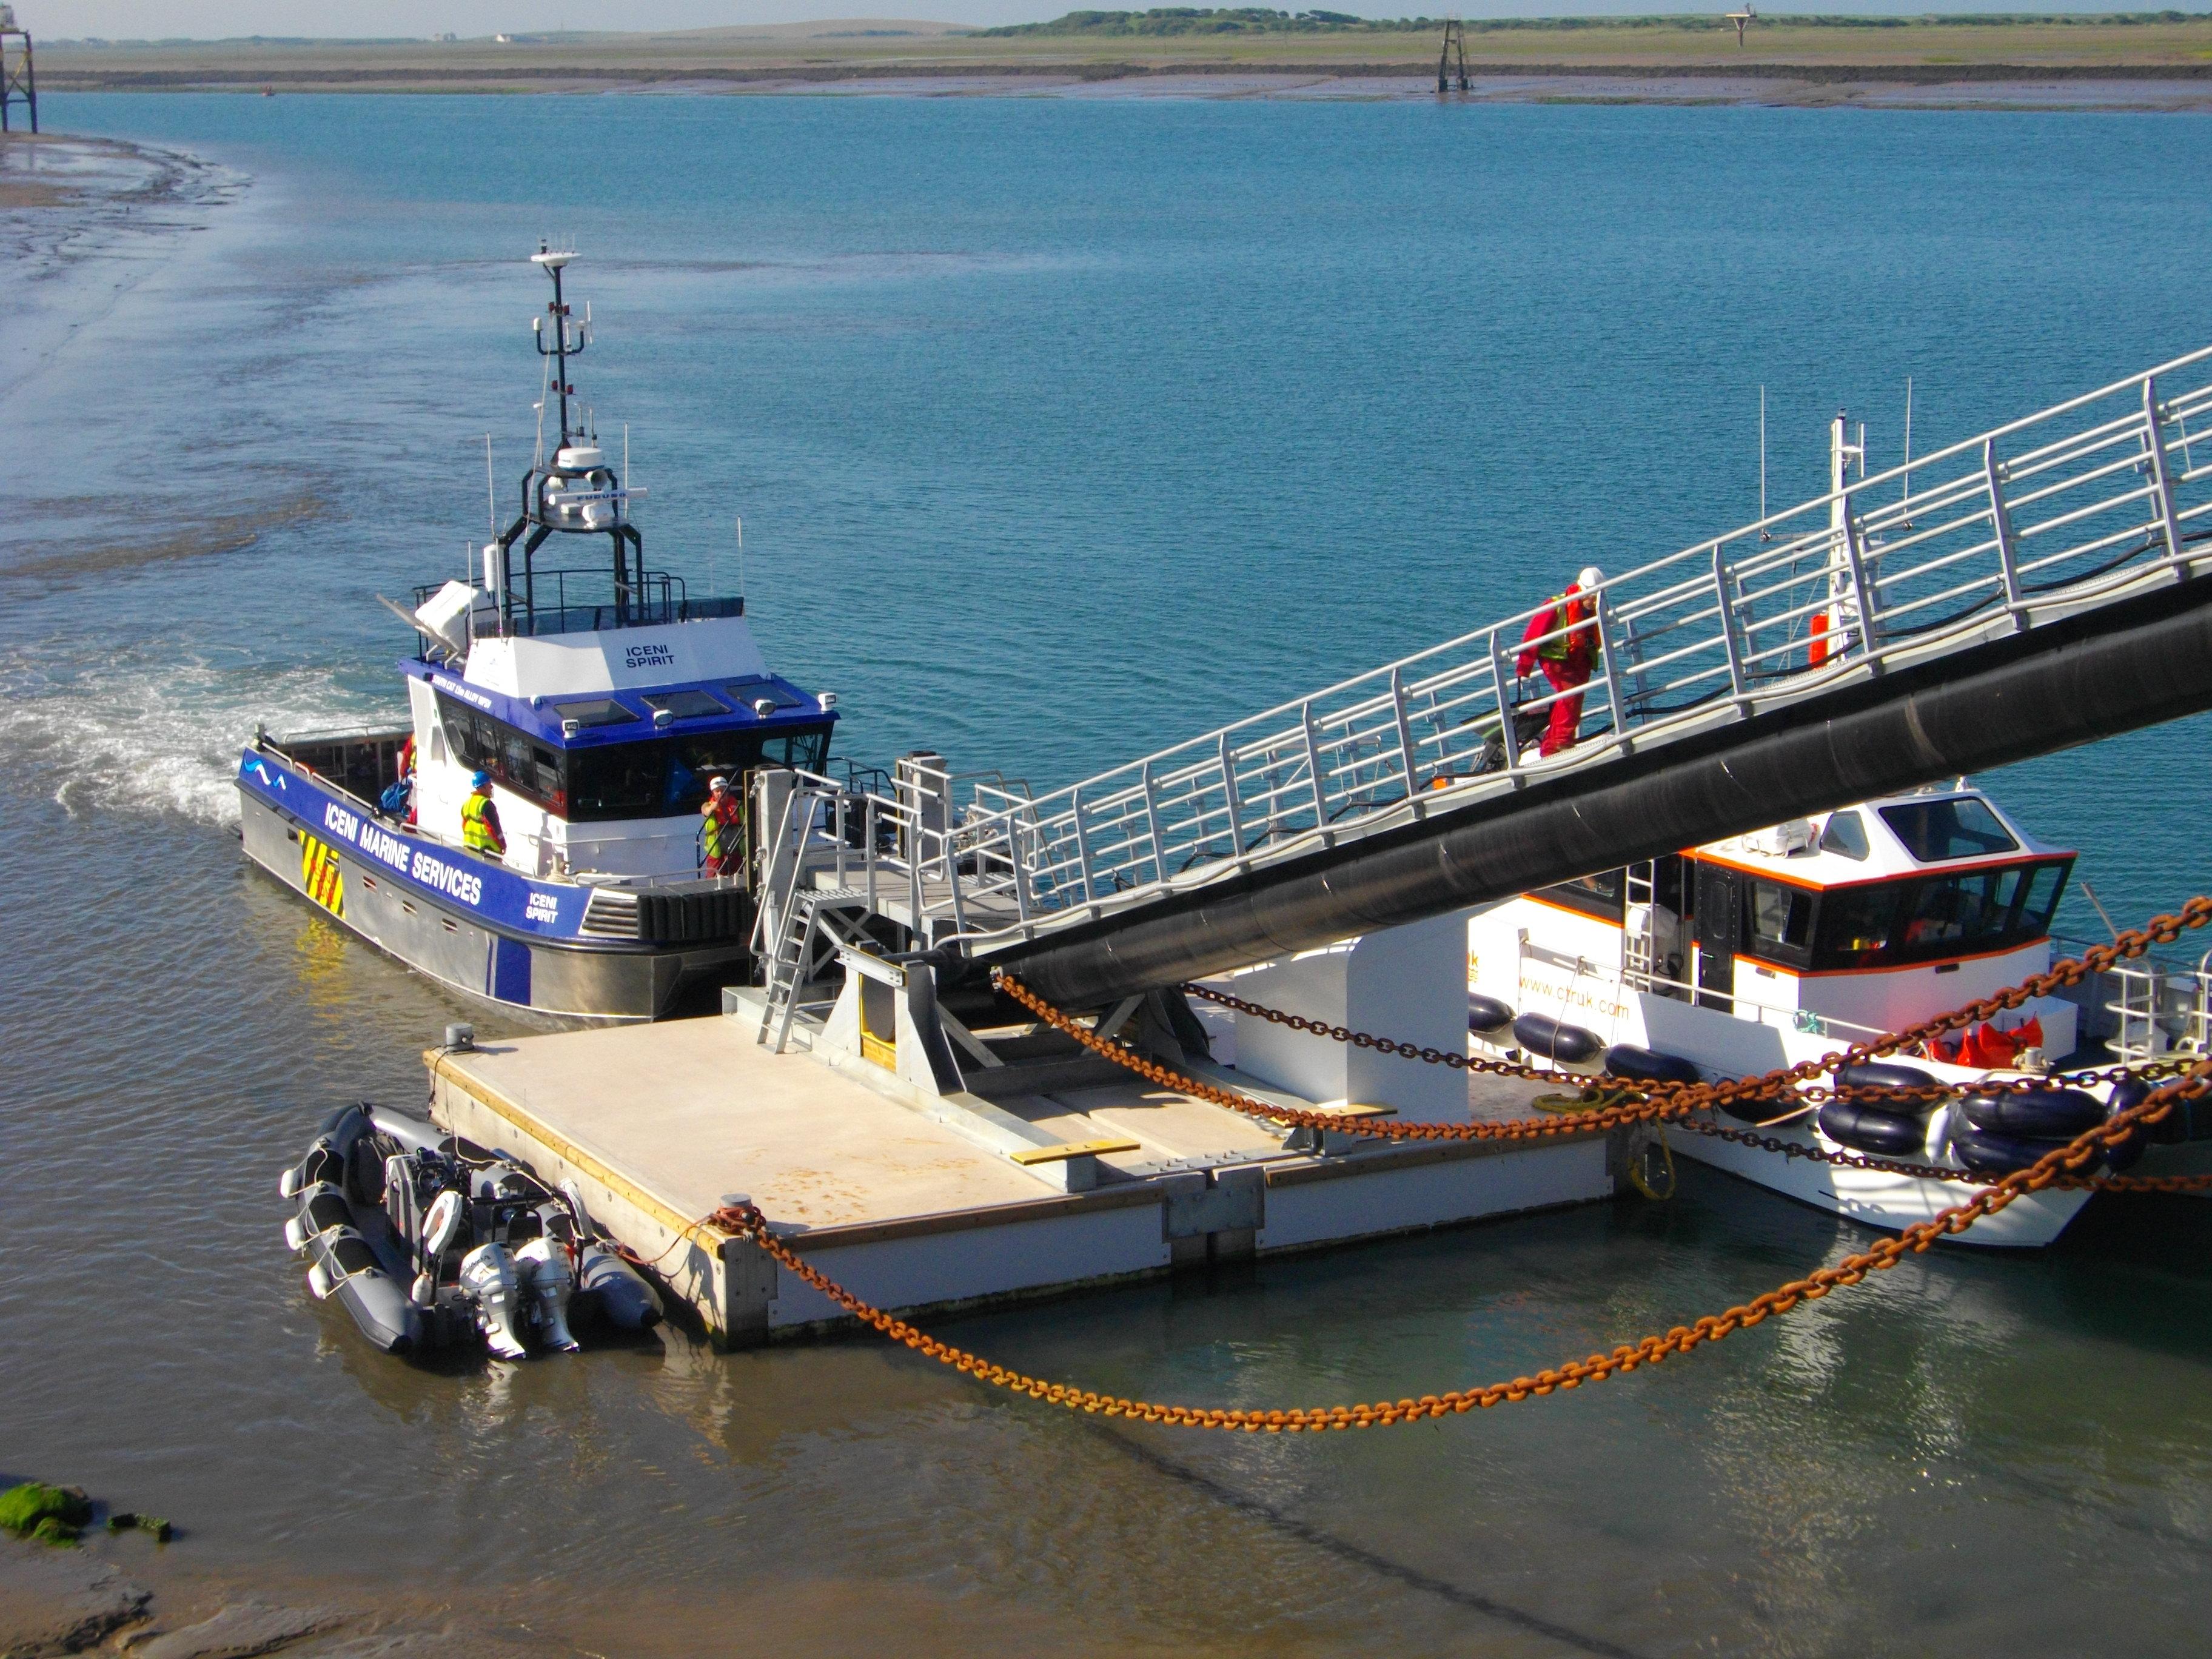 Concrete pontoon, Barrow in Furness